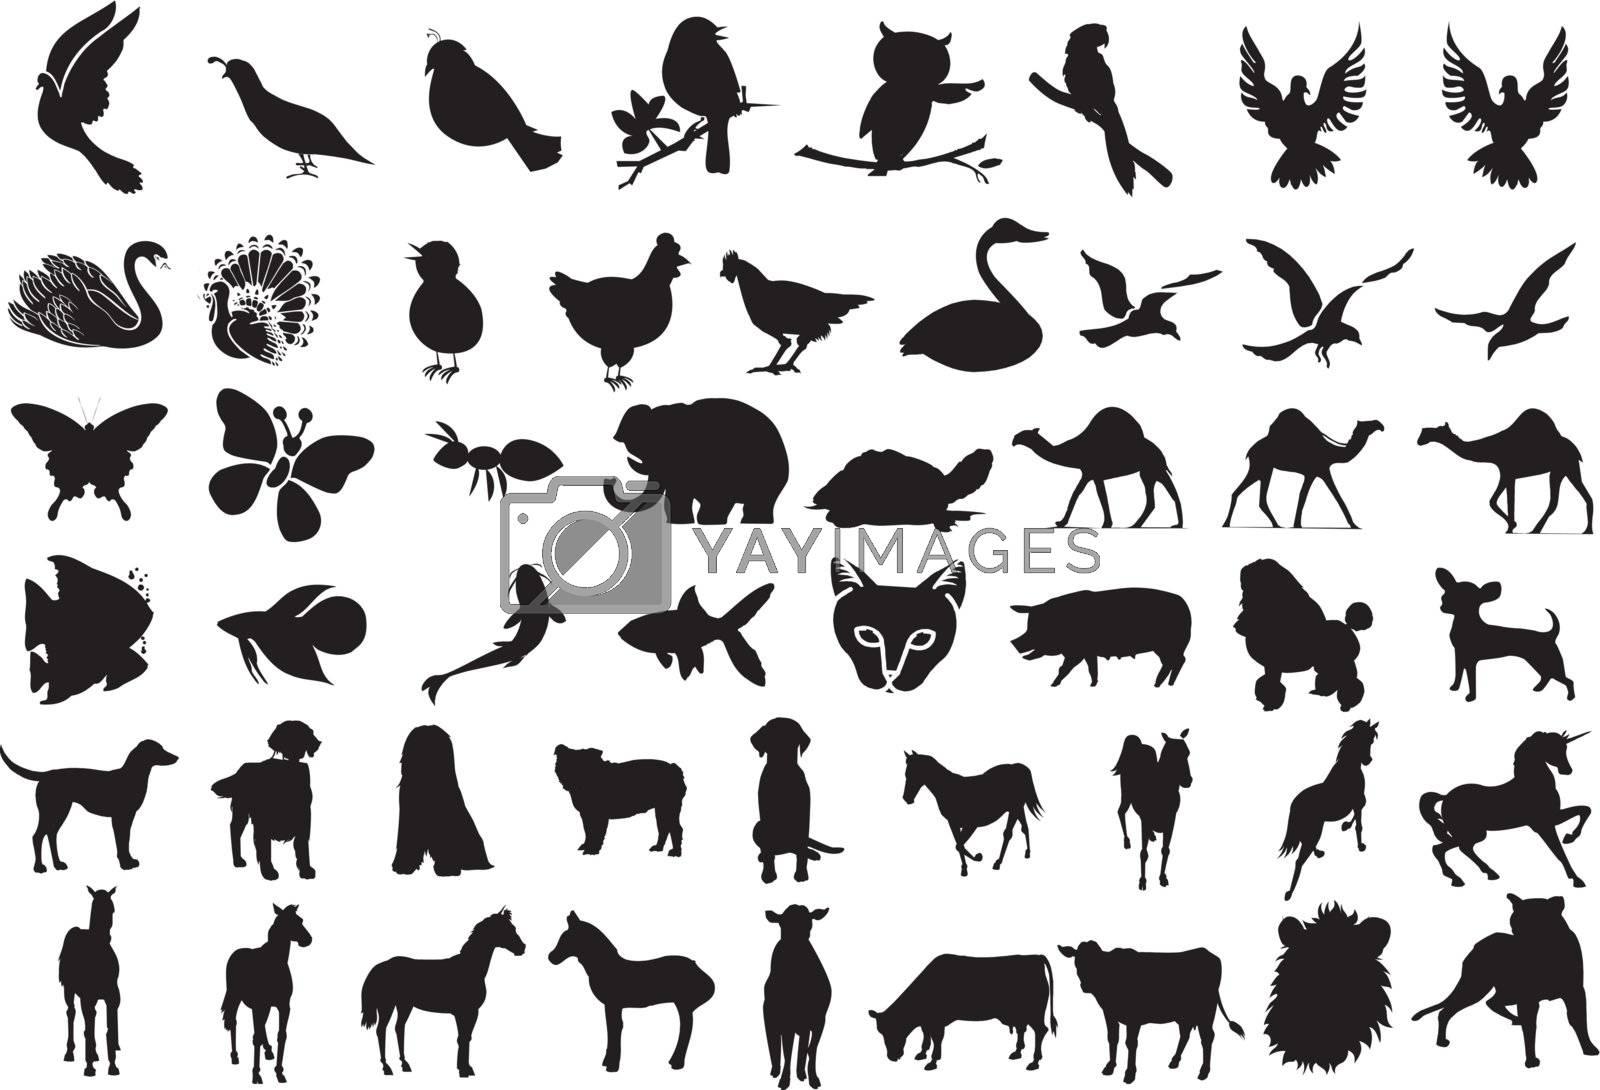 Animal Silhouettes by basheeradesigns